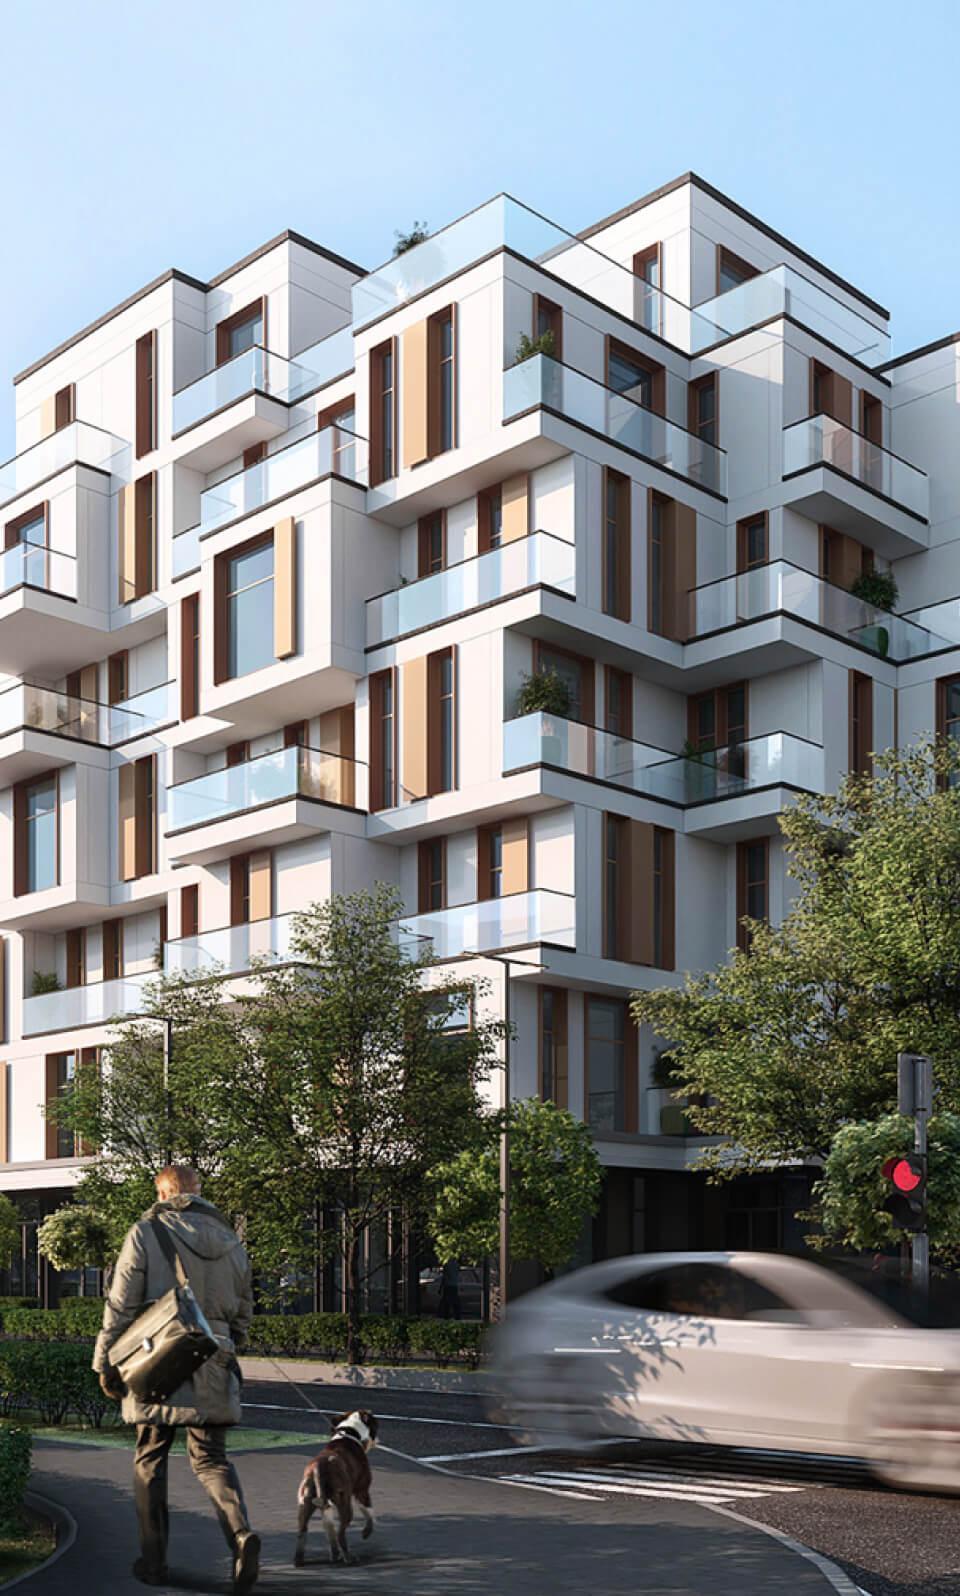 4visions - Immobilie verkaufen